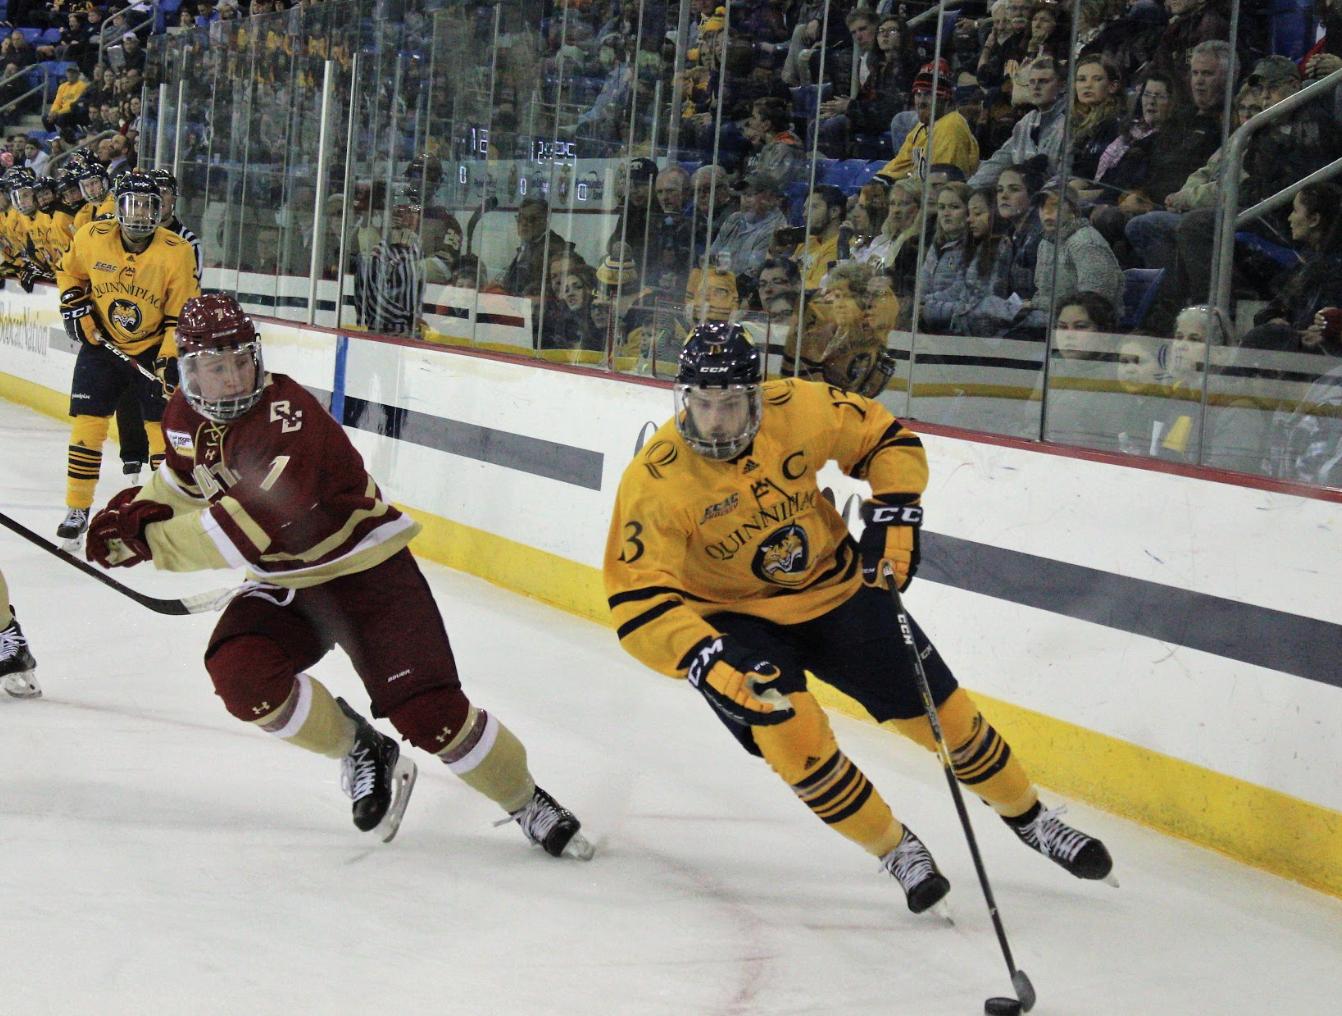 Quinnipiac men's ice hockey upsets No. 18 Boston College, 1-0